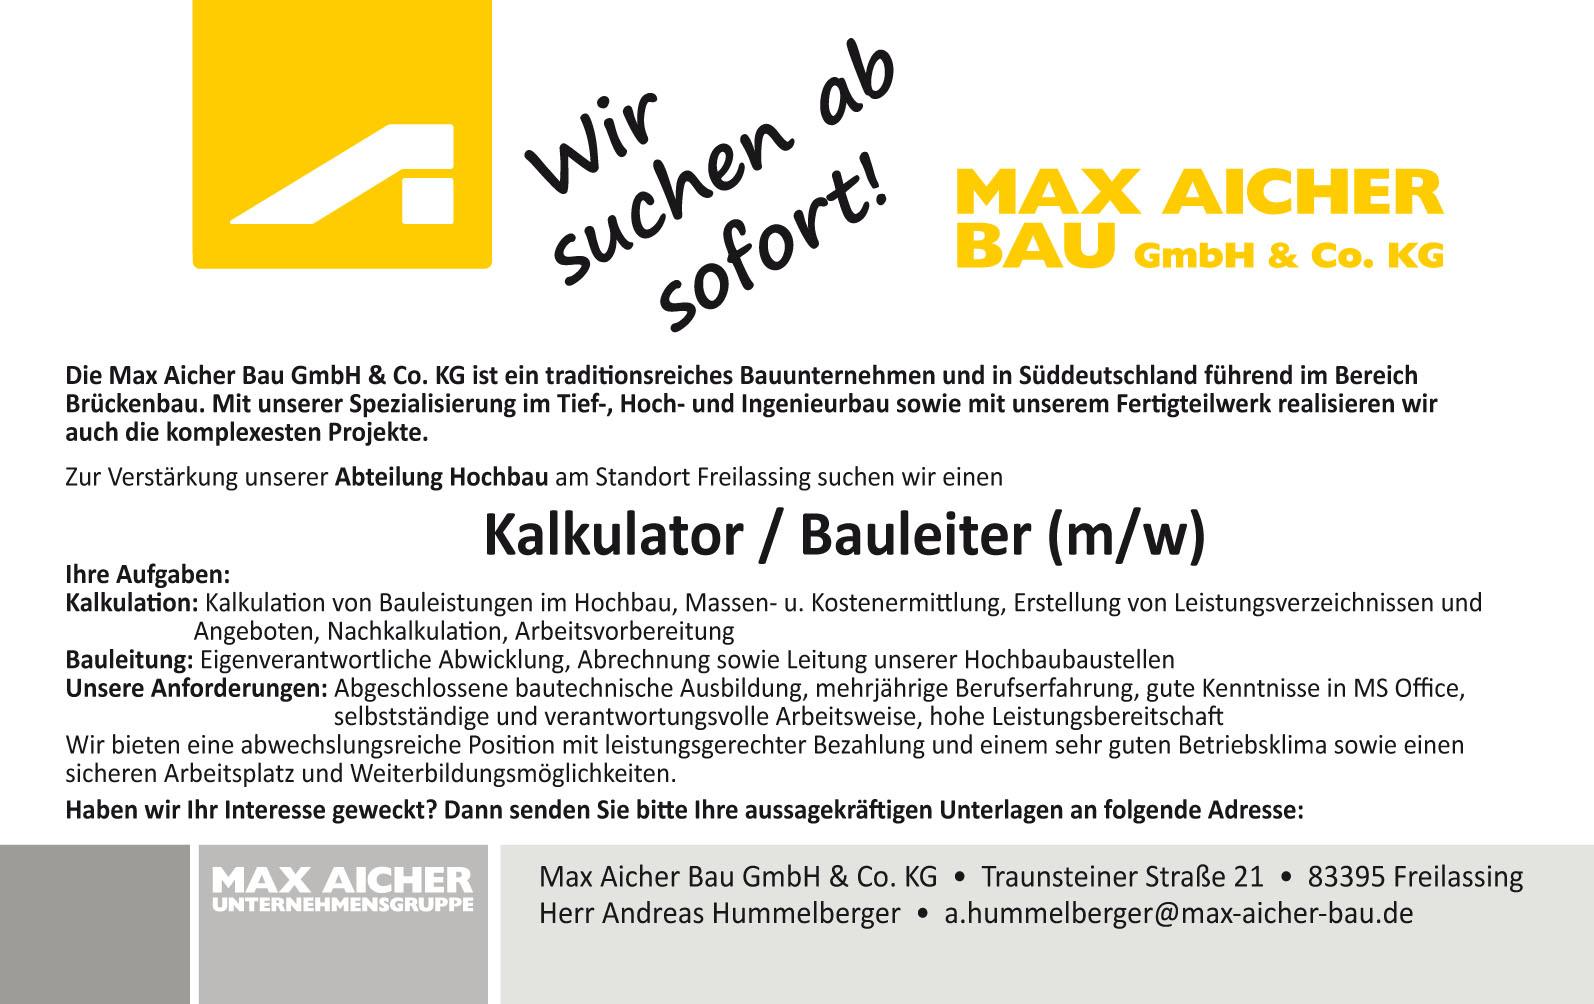 12.01.17 Bauleiter & Kalkulator